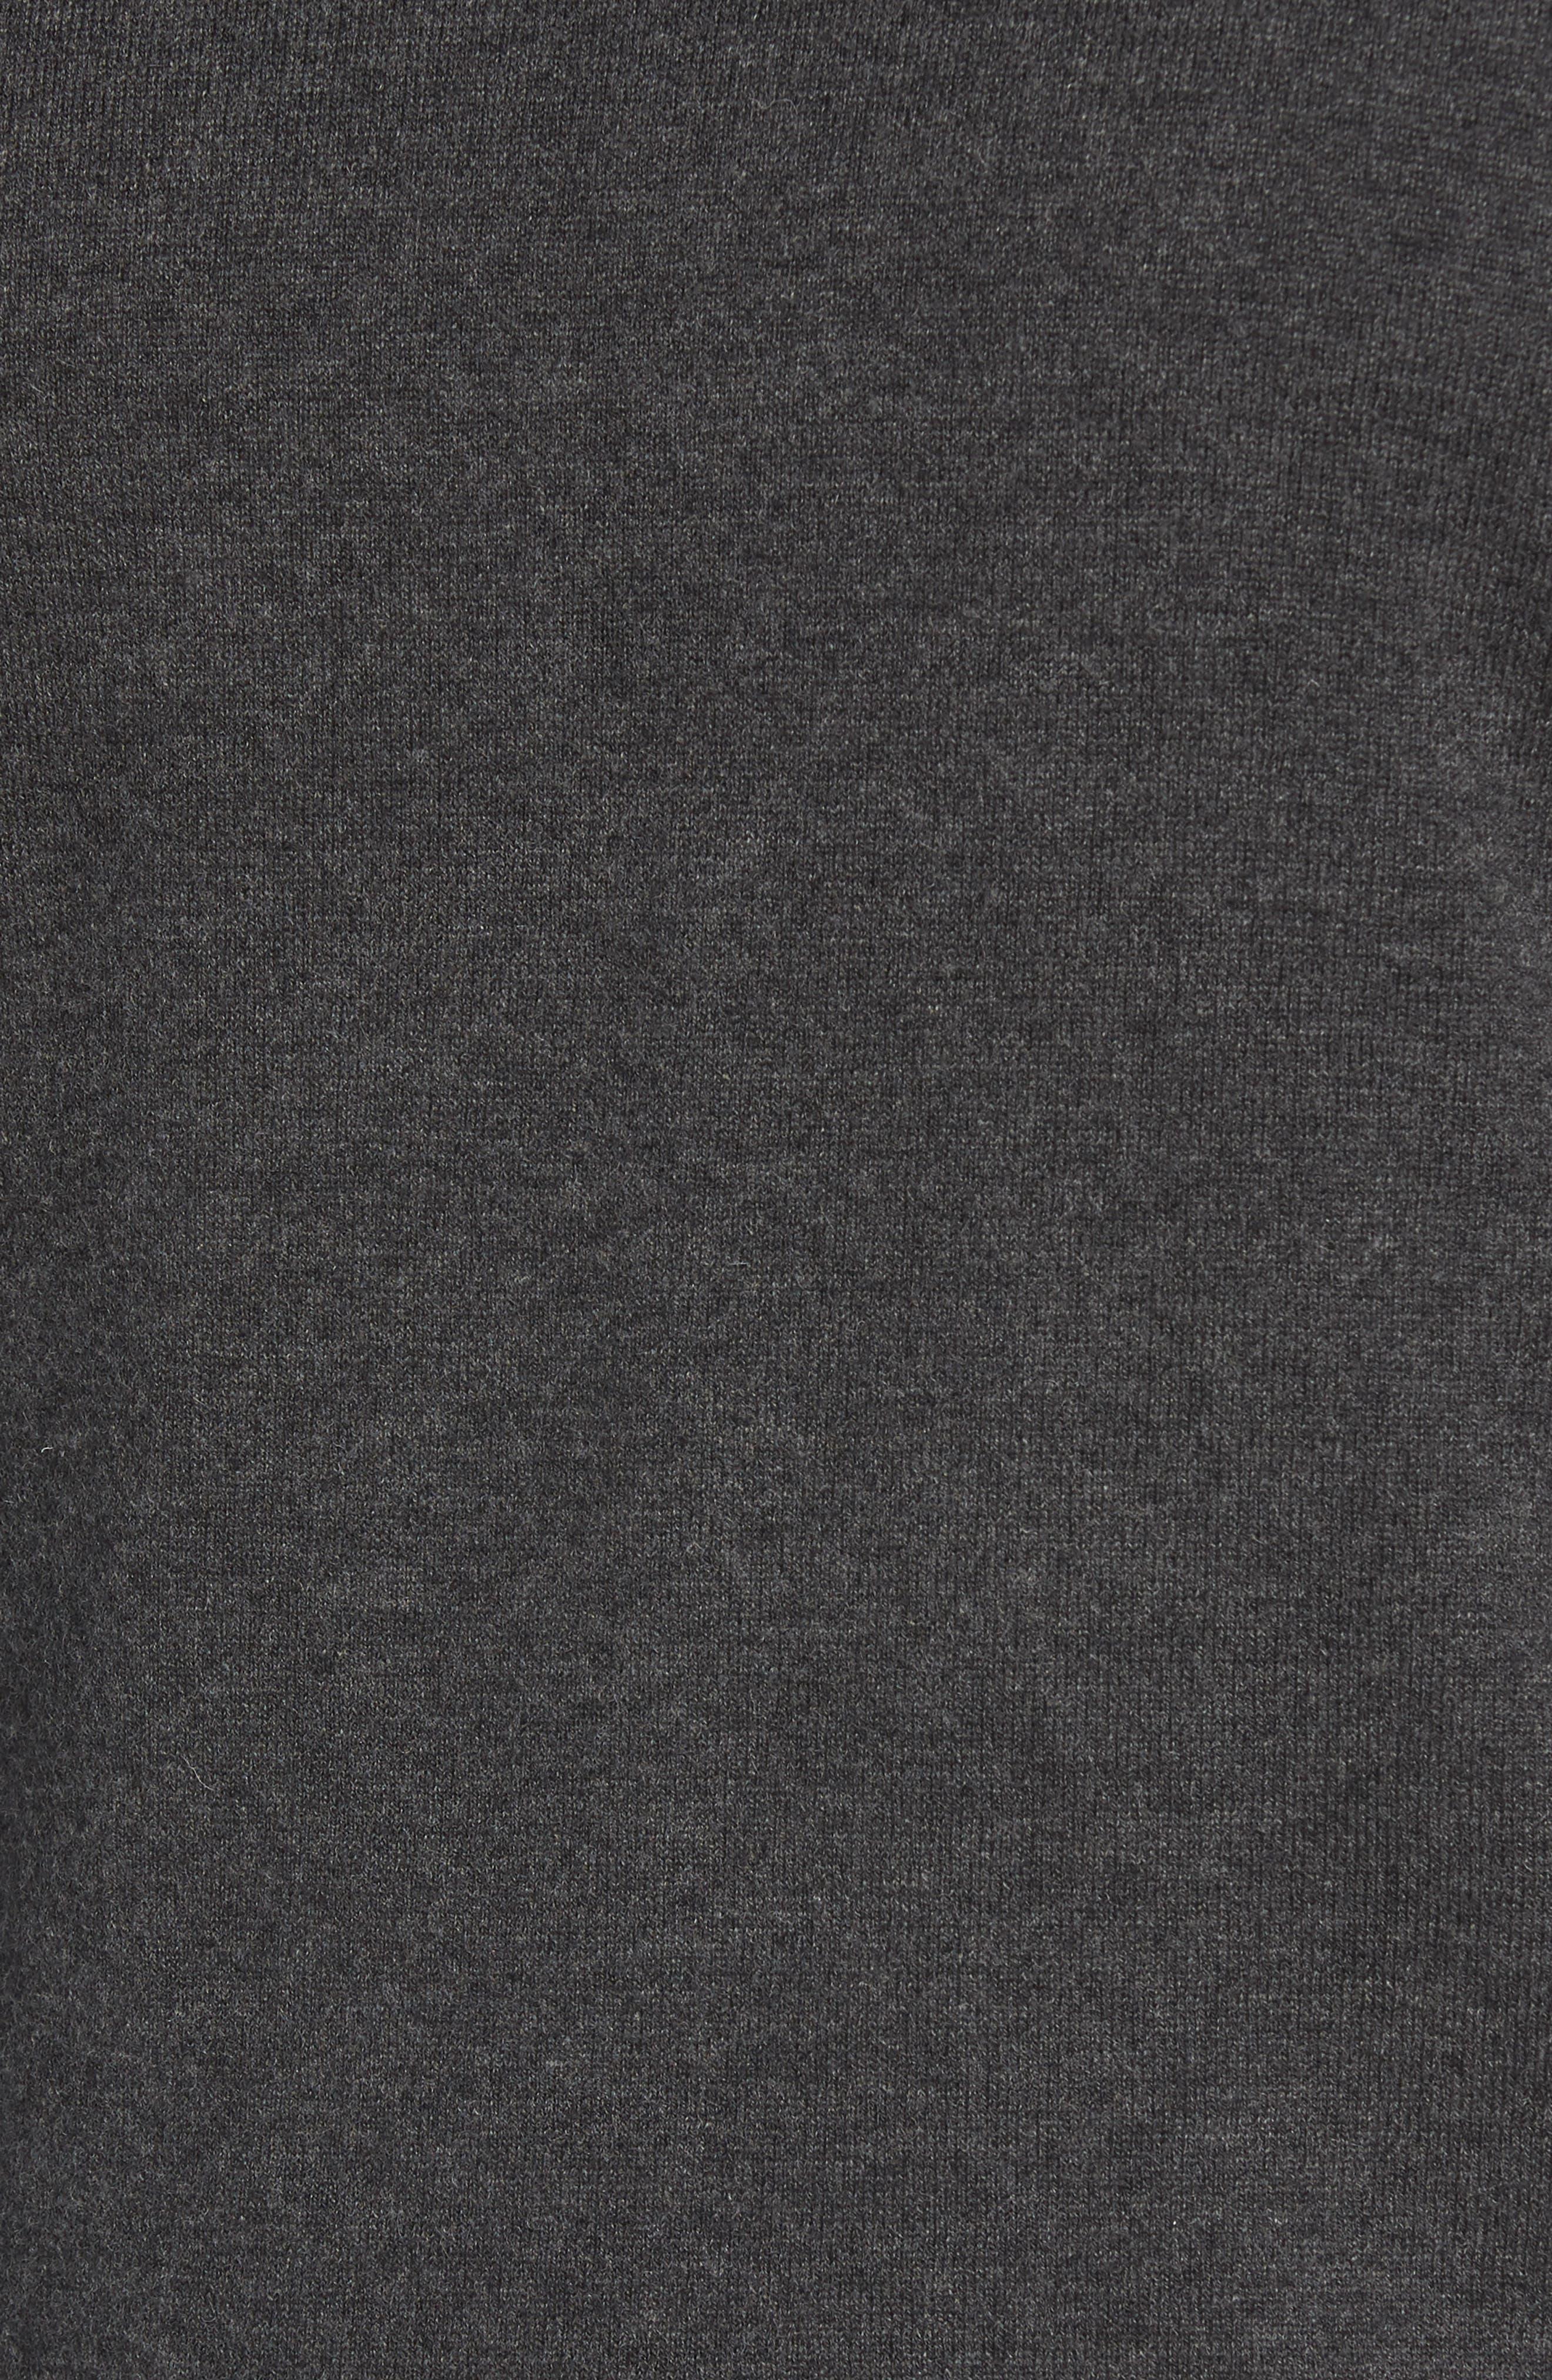 Wool & Cotton Crewneck Sweater,                             Alternate thumbnail 5, color,                             022